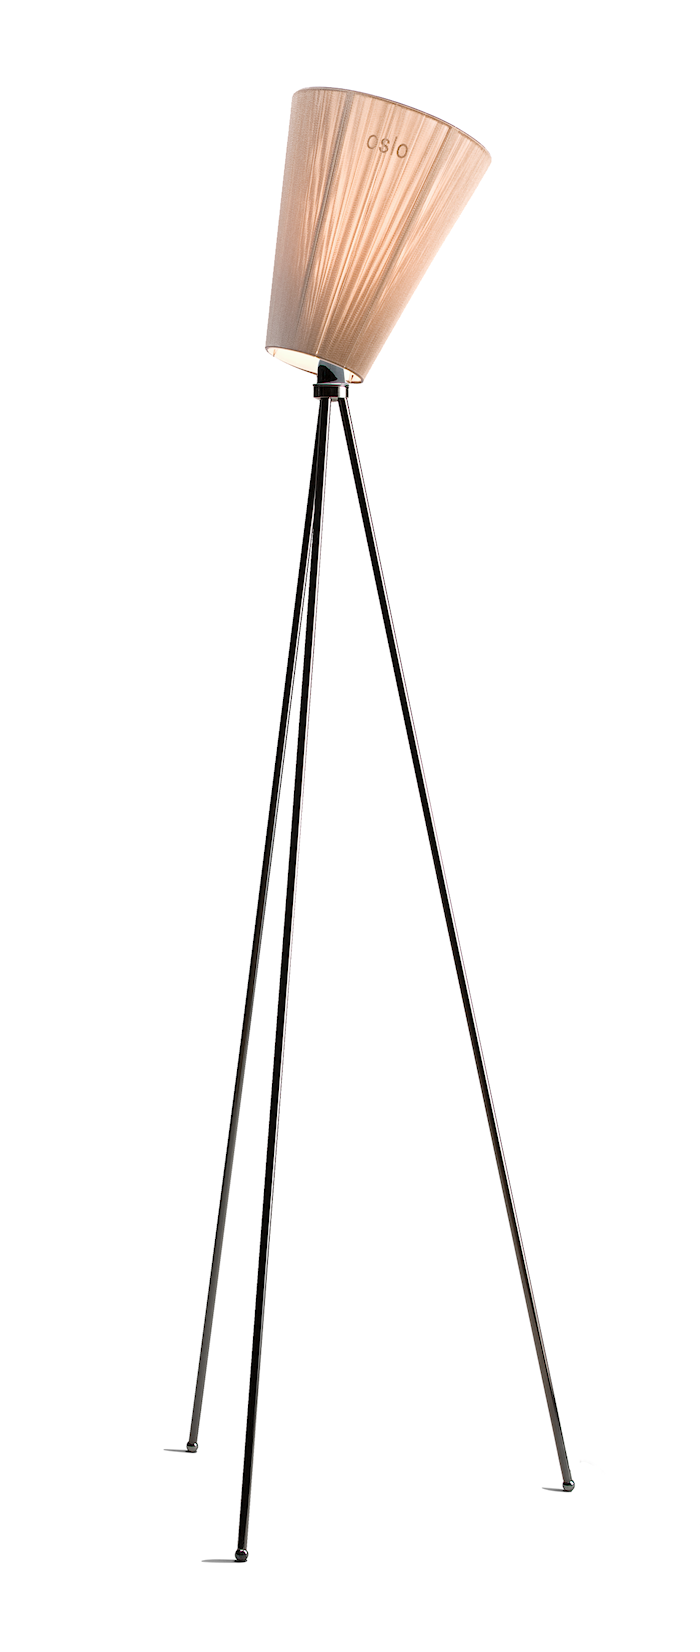 Oslo Wood gulvlampe - Beige skærm/Sort fod